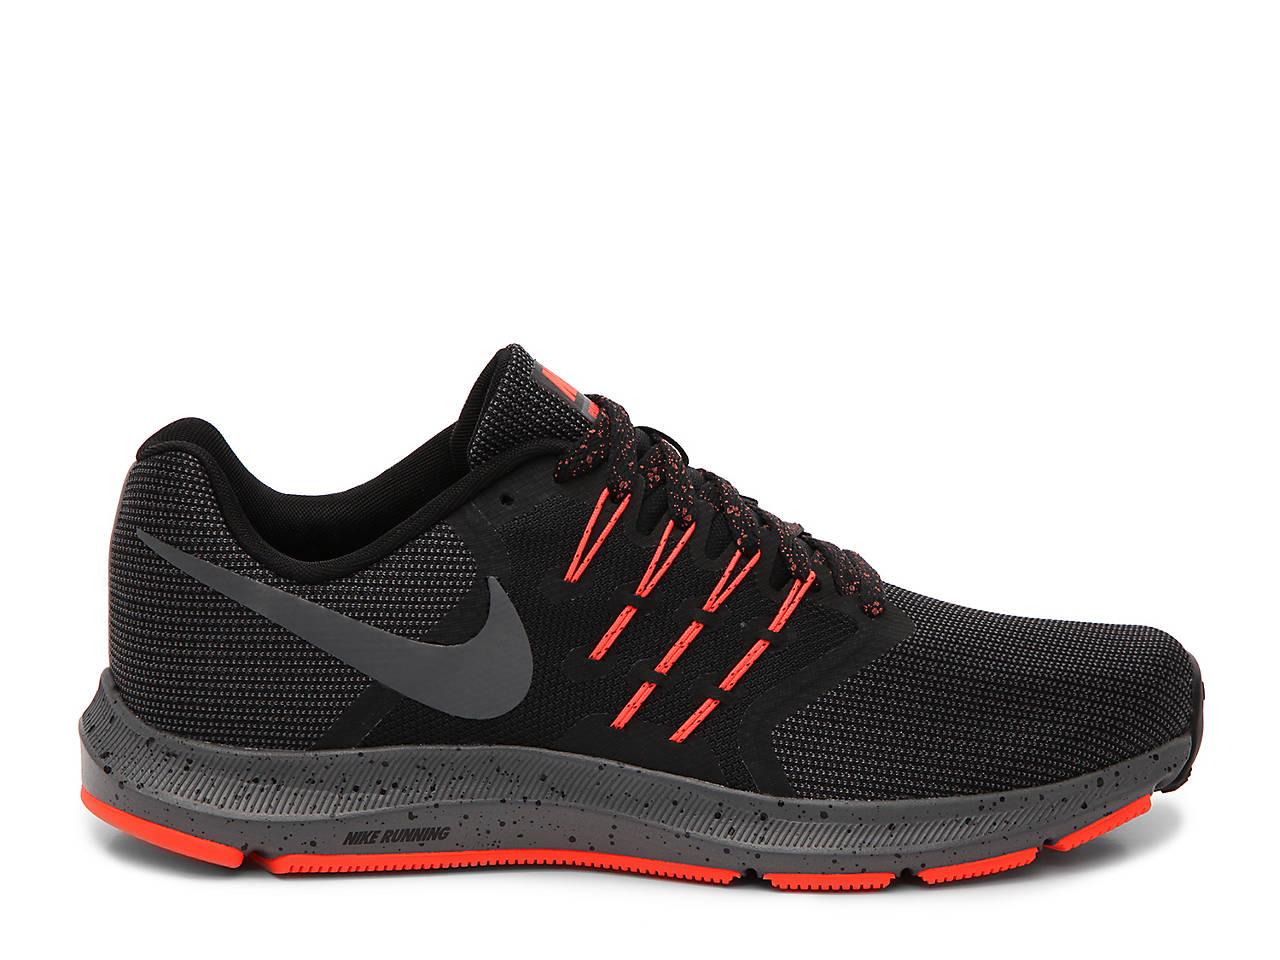 db431f6bc8a Nike Run Swift Lightweight Running Shoe - Men s Men s Shoes